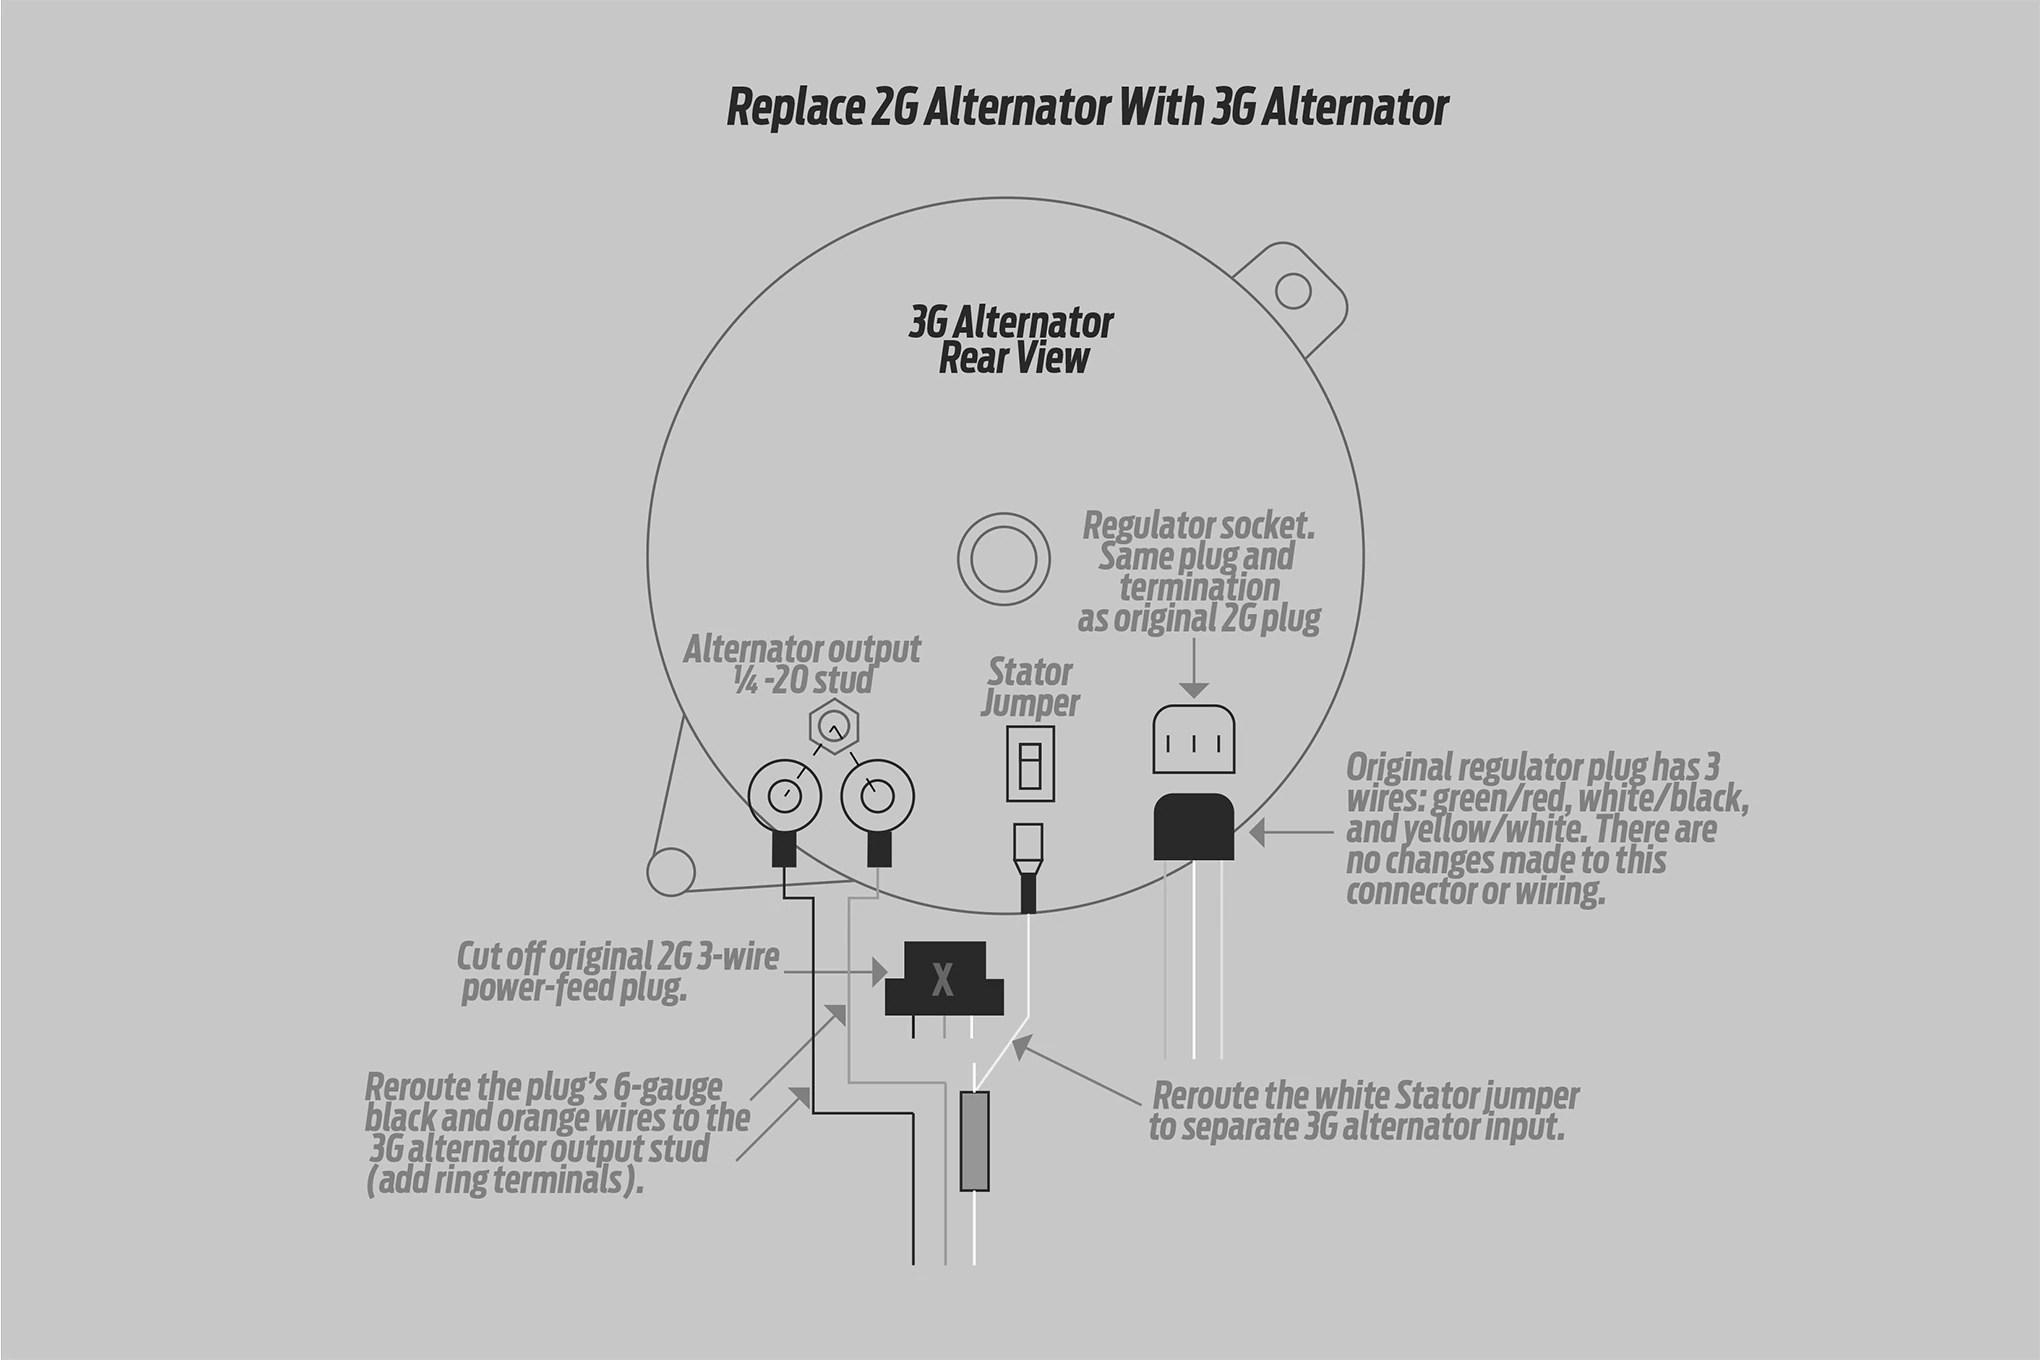 ford 2g alternator wiring wiring diagram mega ford 2g alternator wiring [ 2040 x 1360 Pixel ]